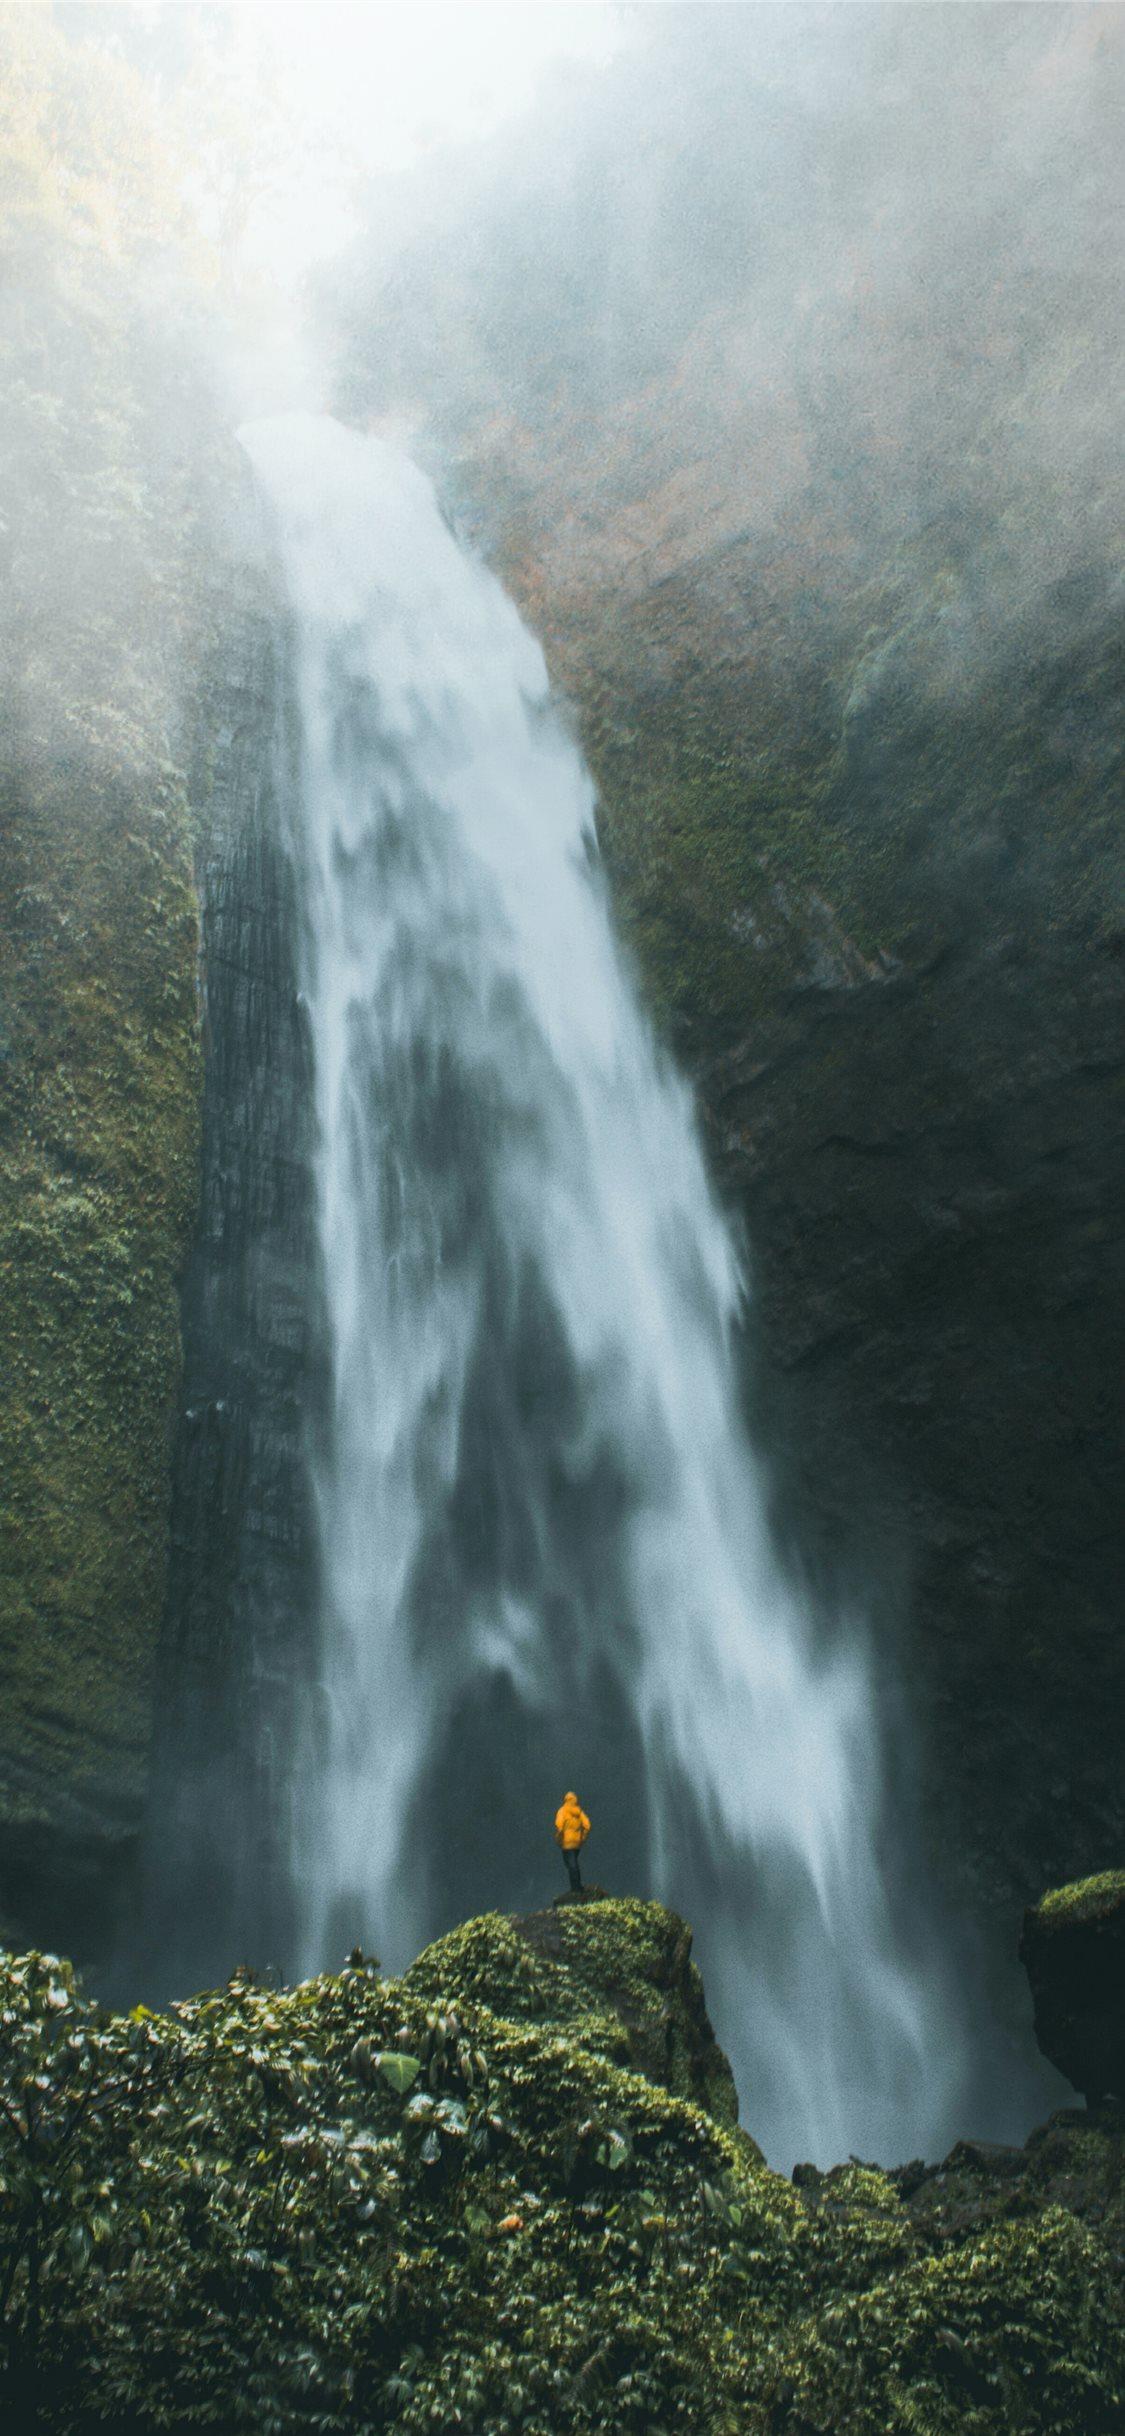 Kabut Pelangi Waterfall The Real Beauty Of Nature Iphone X Wallpaper